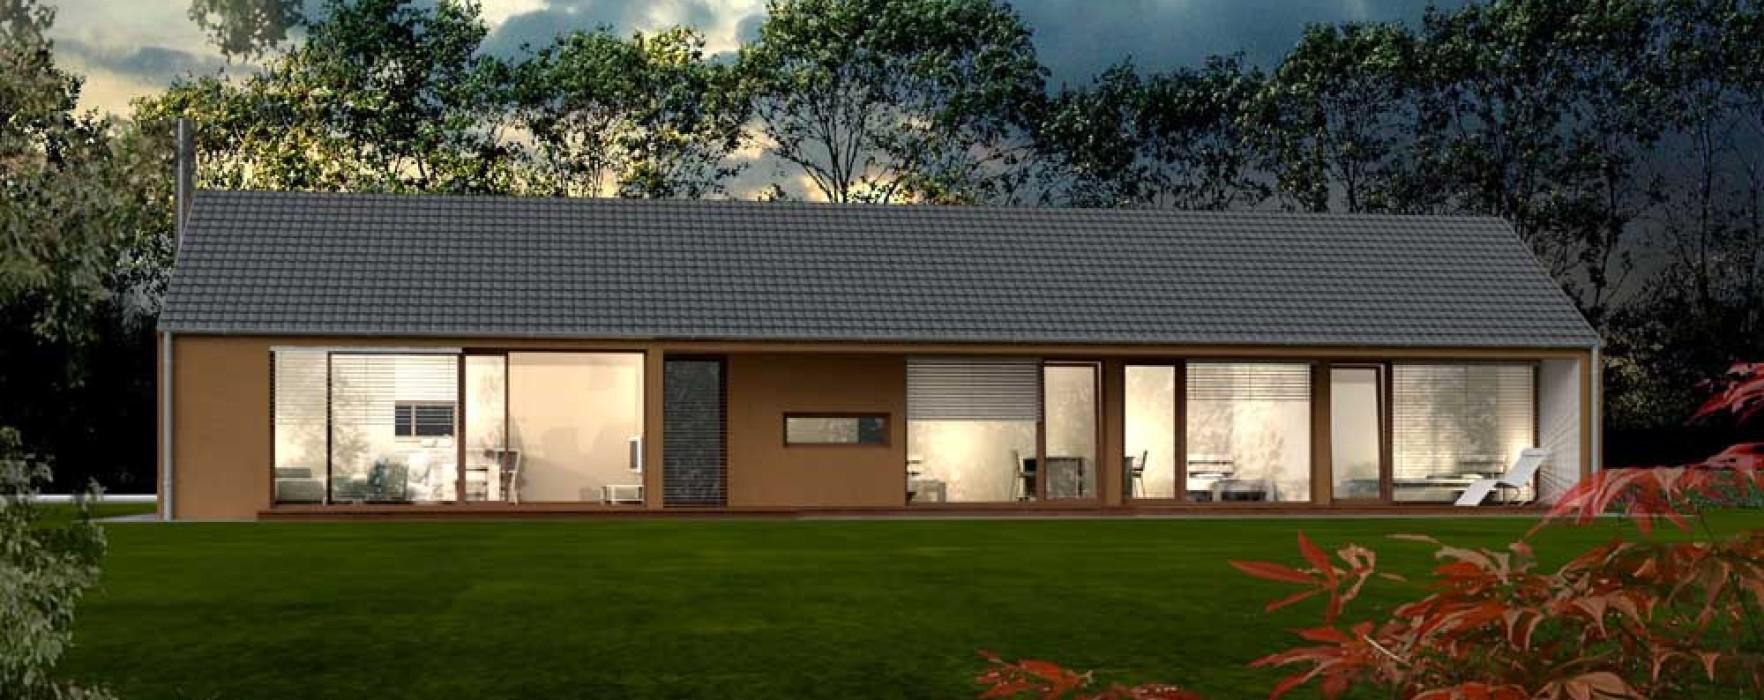 Prezzi indicativi per due case prefabbricate for Permessi per case in legno